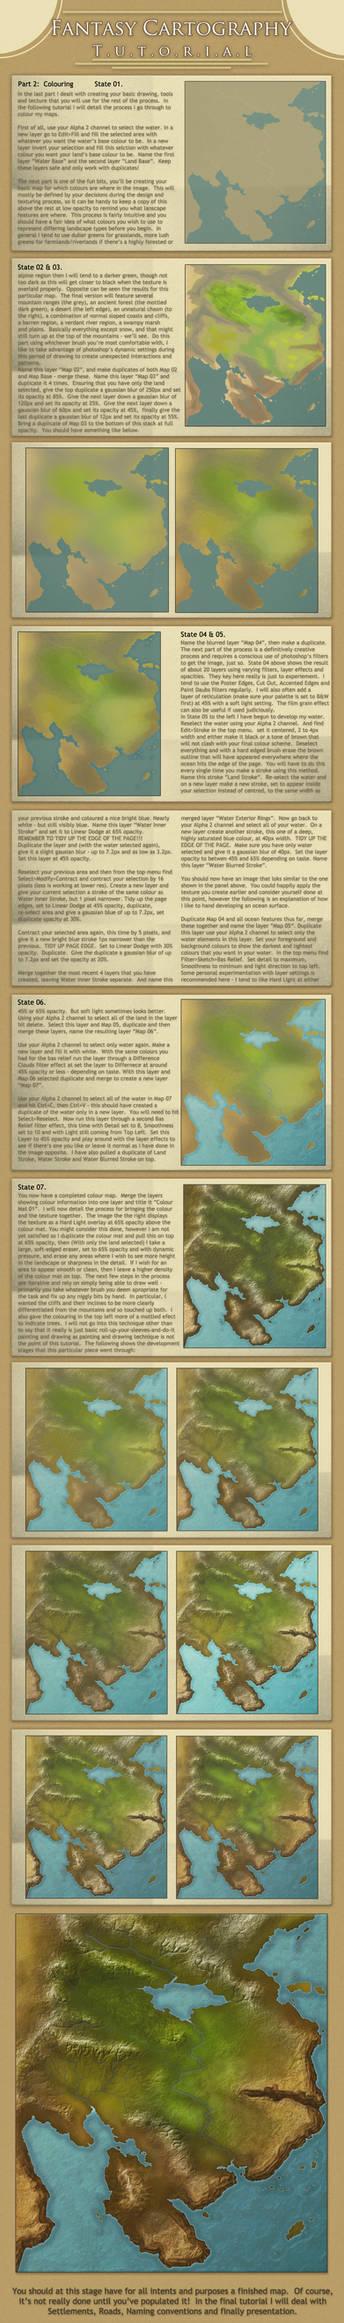 Cartography Tutorial part 2:  Colouring